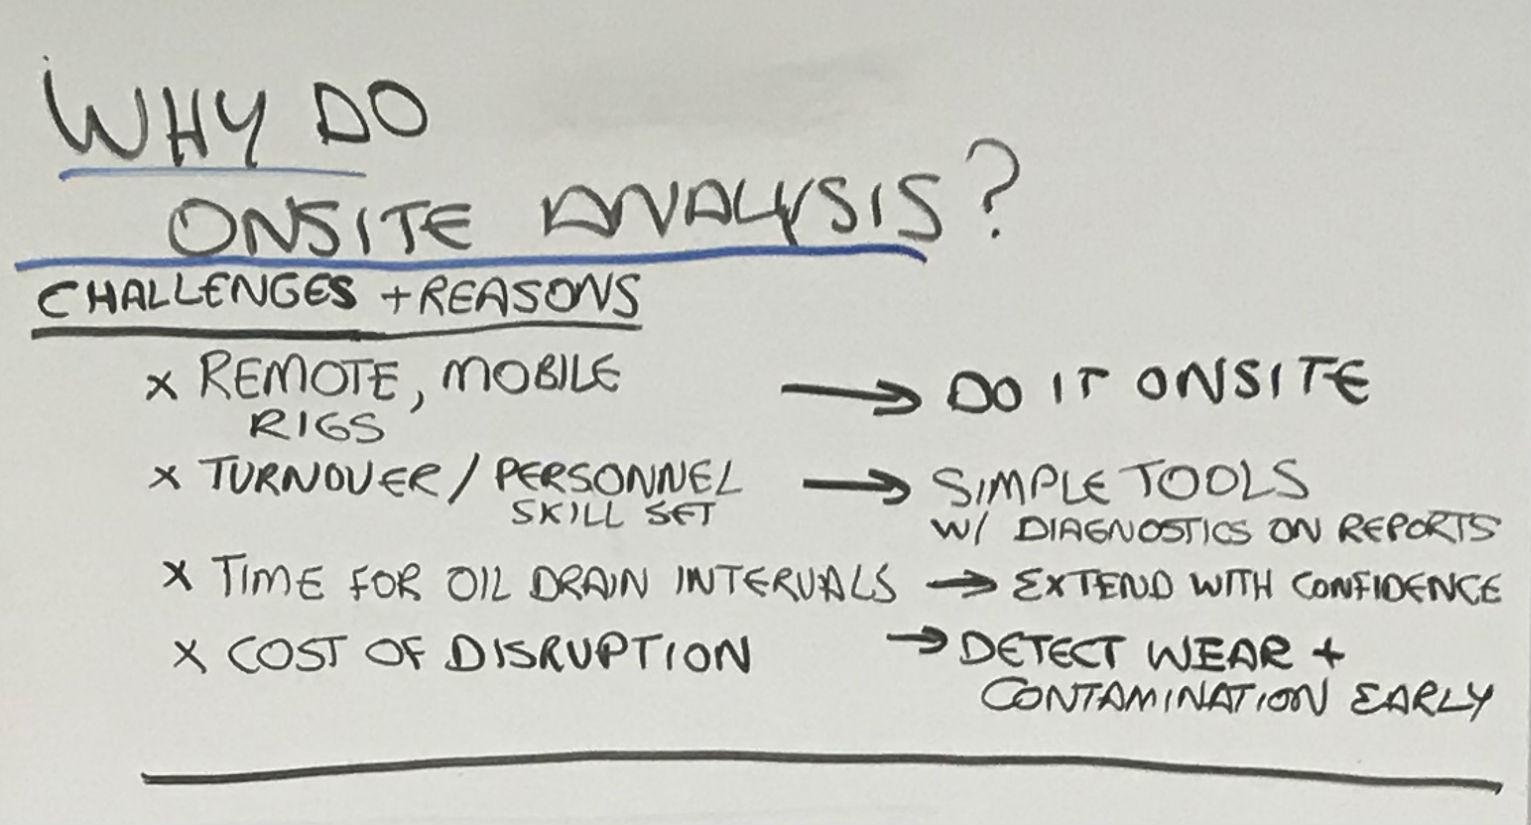 why do onsite analysis